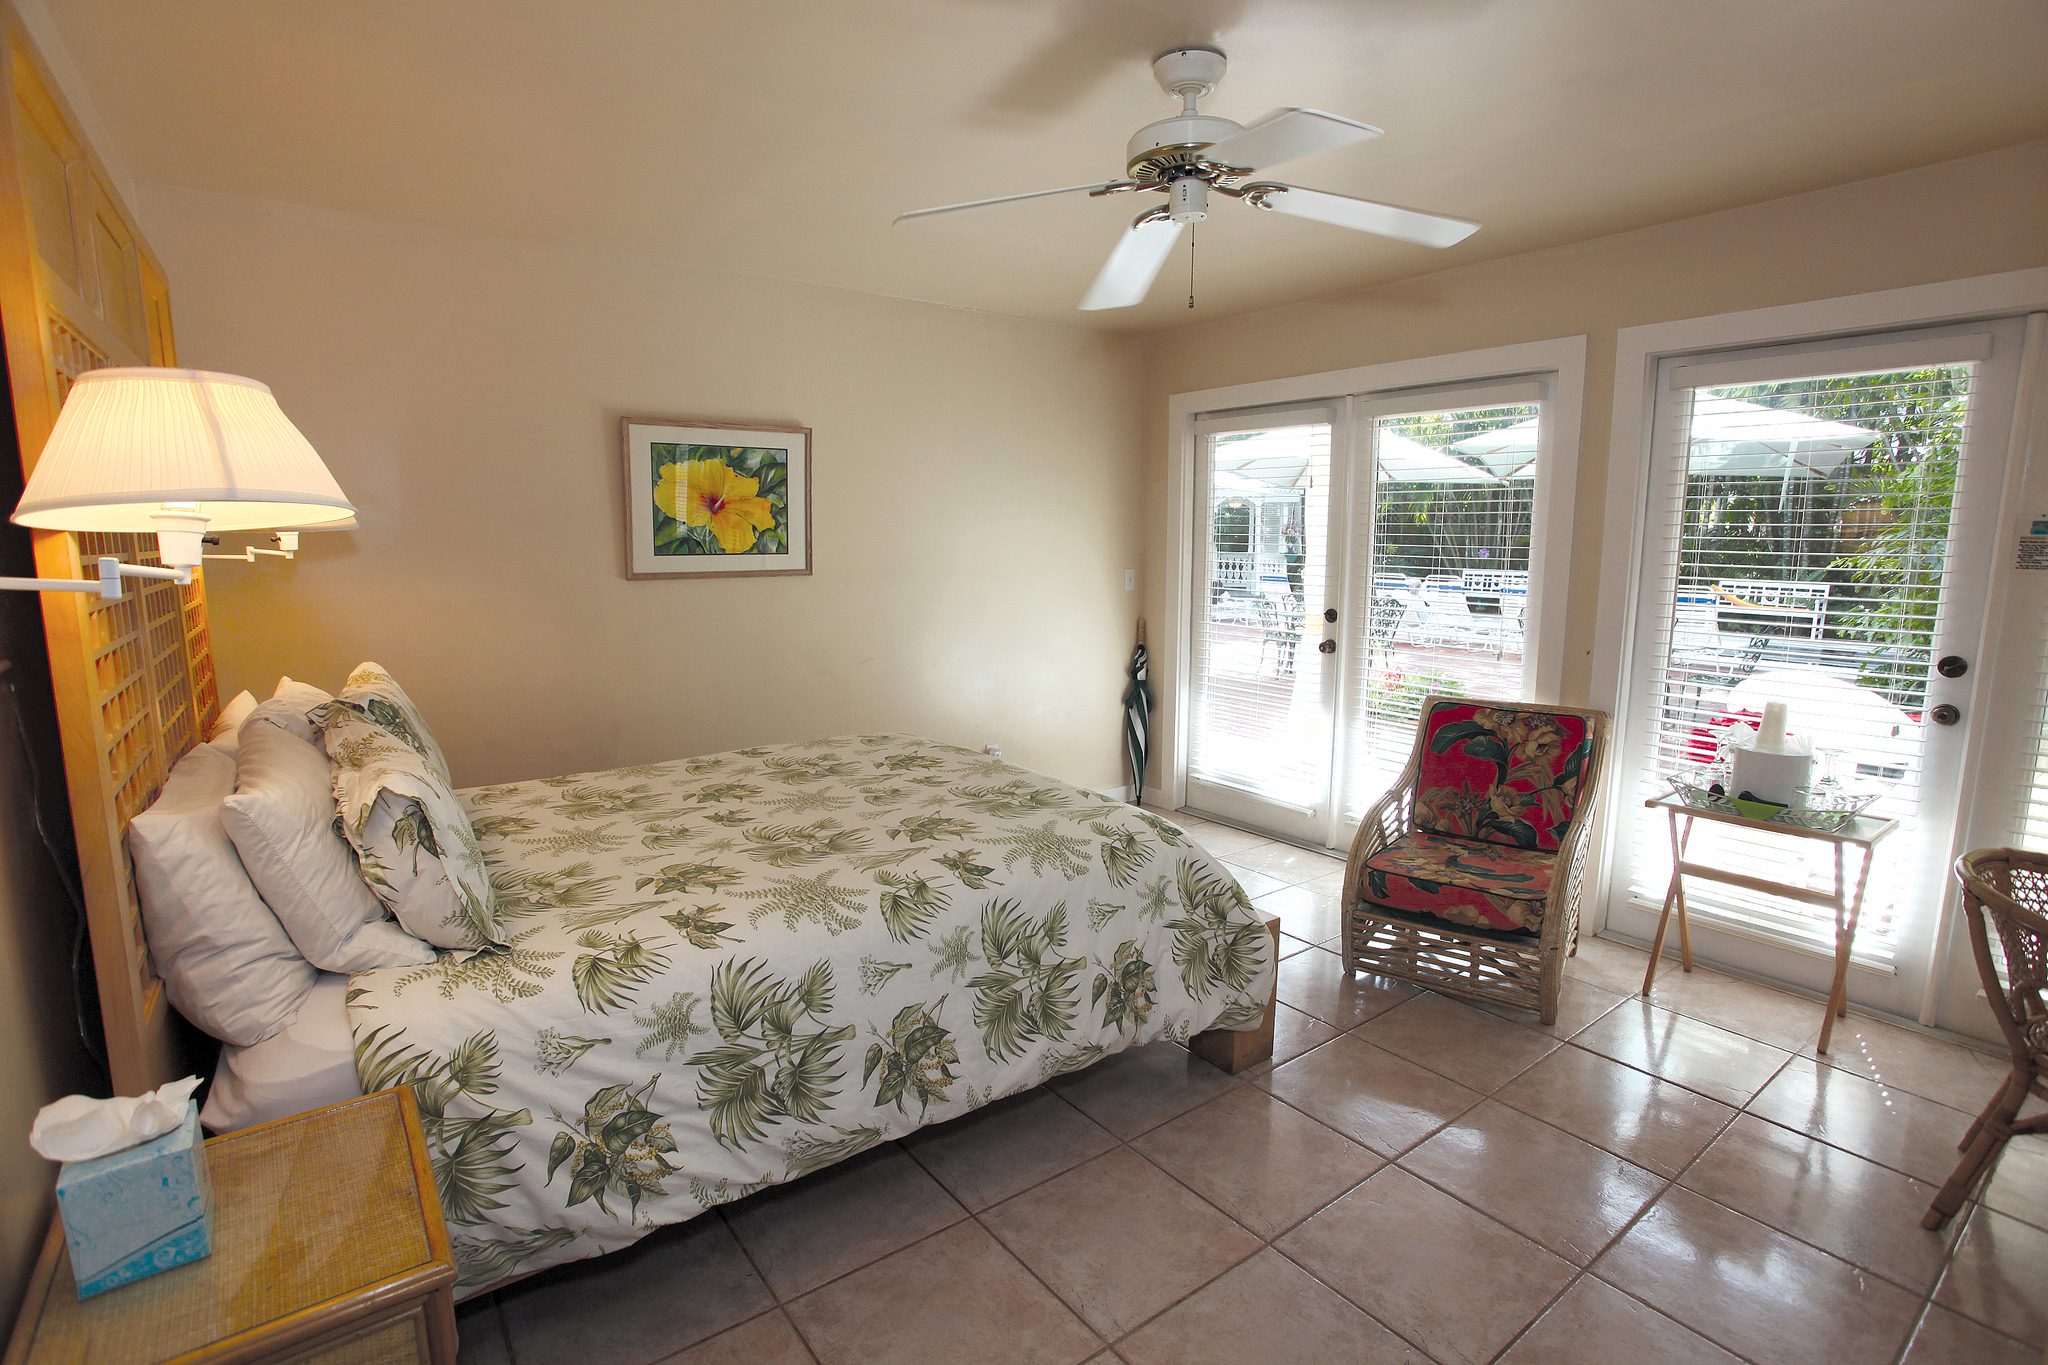 ambrosia-guest-house-room-5.jpg